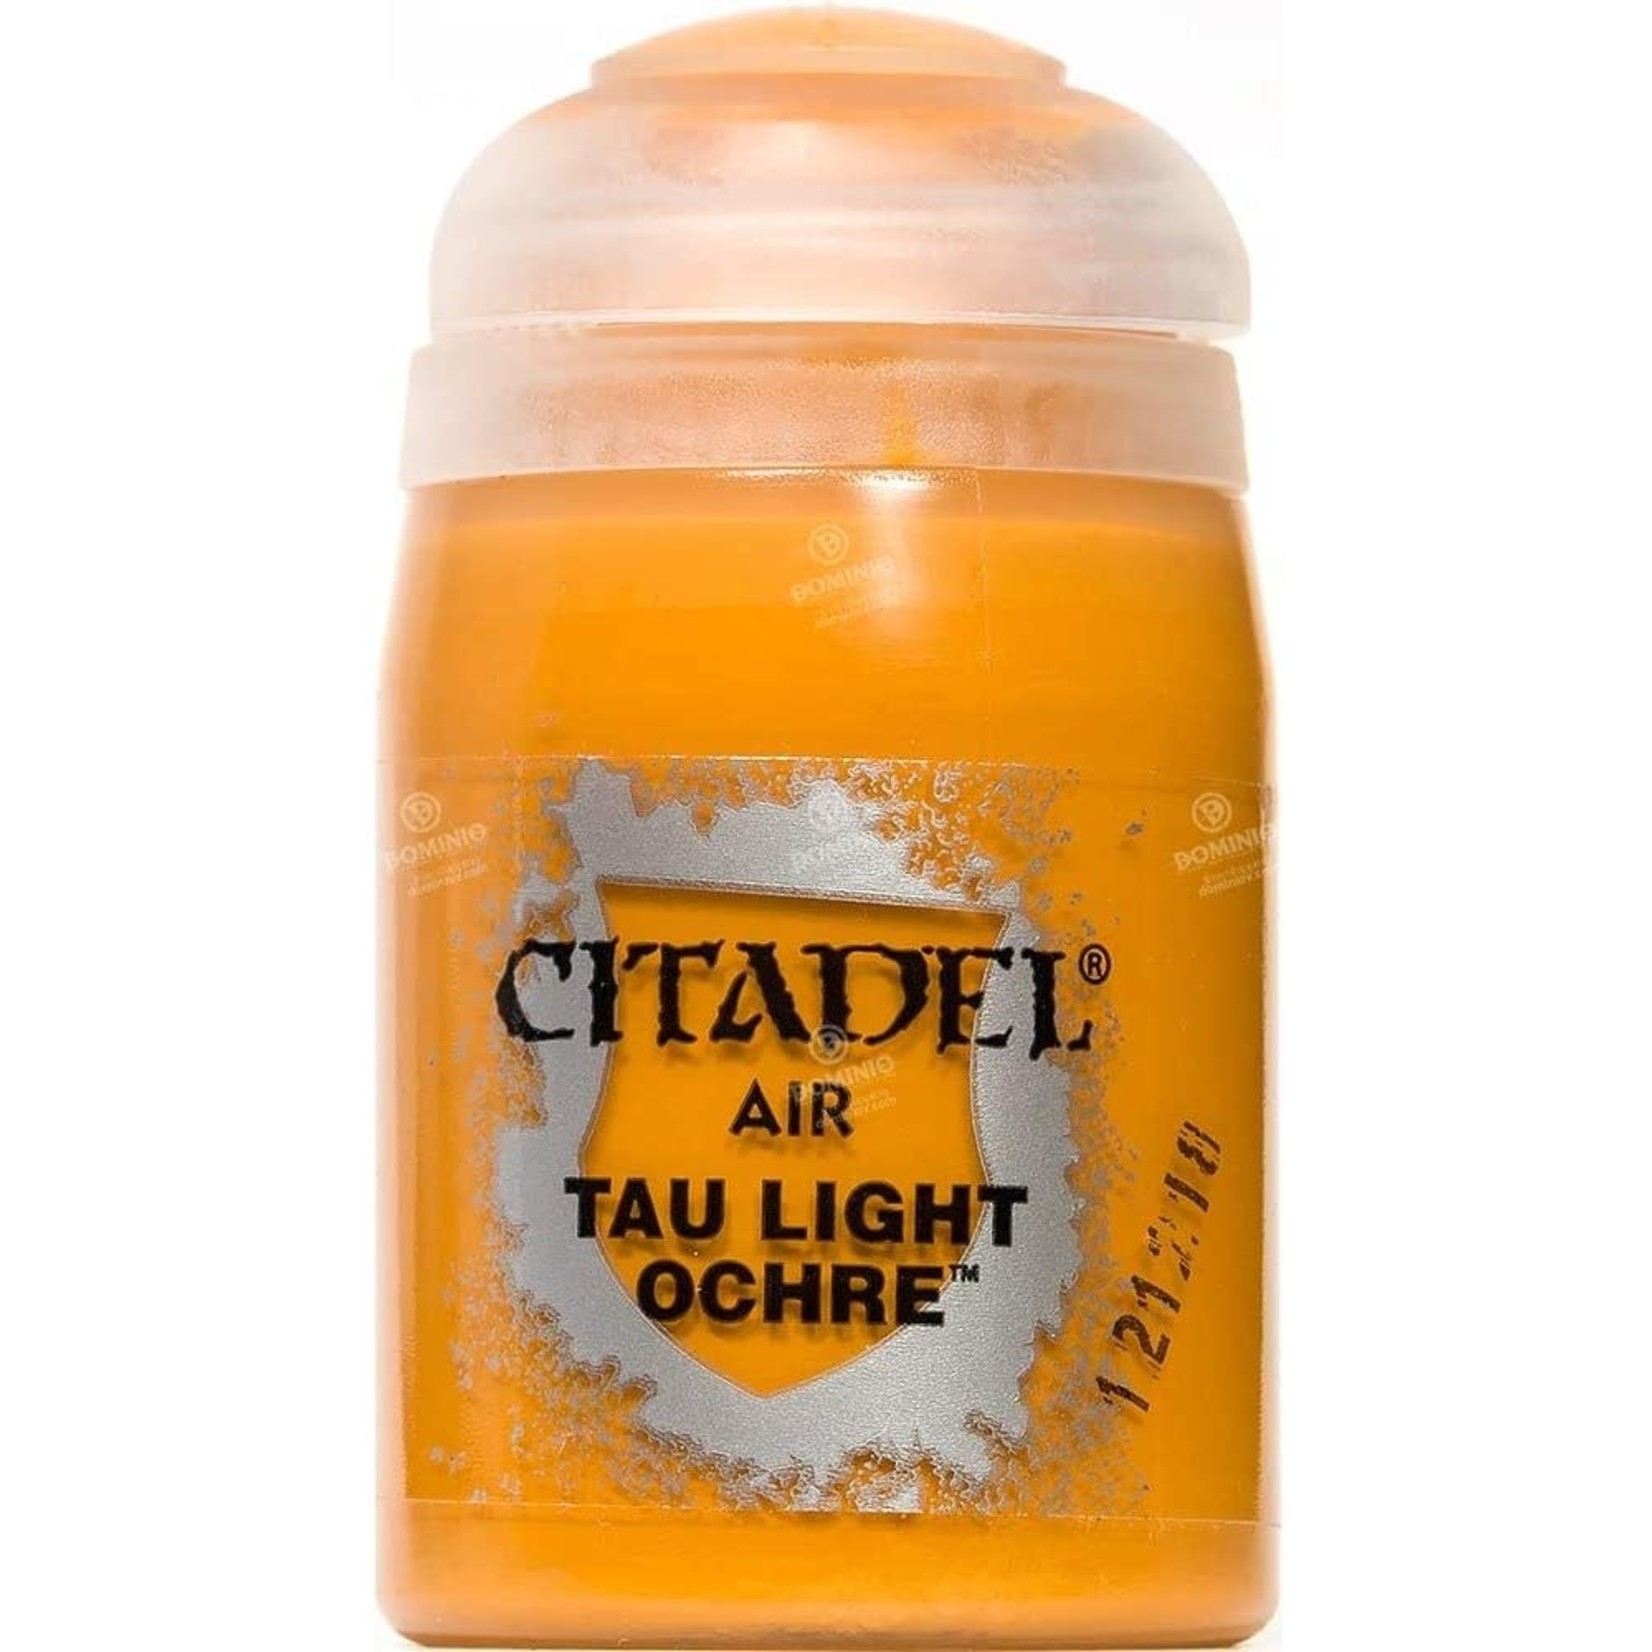 Games Workshop Citadel Paint: Tau Light Ochre Air (24 ml)